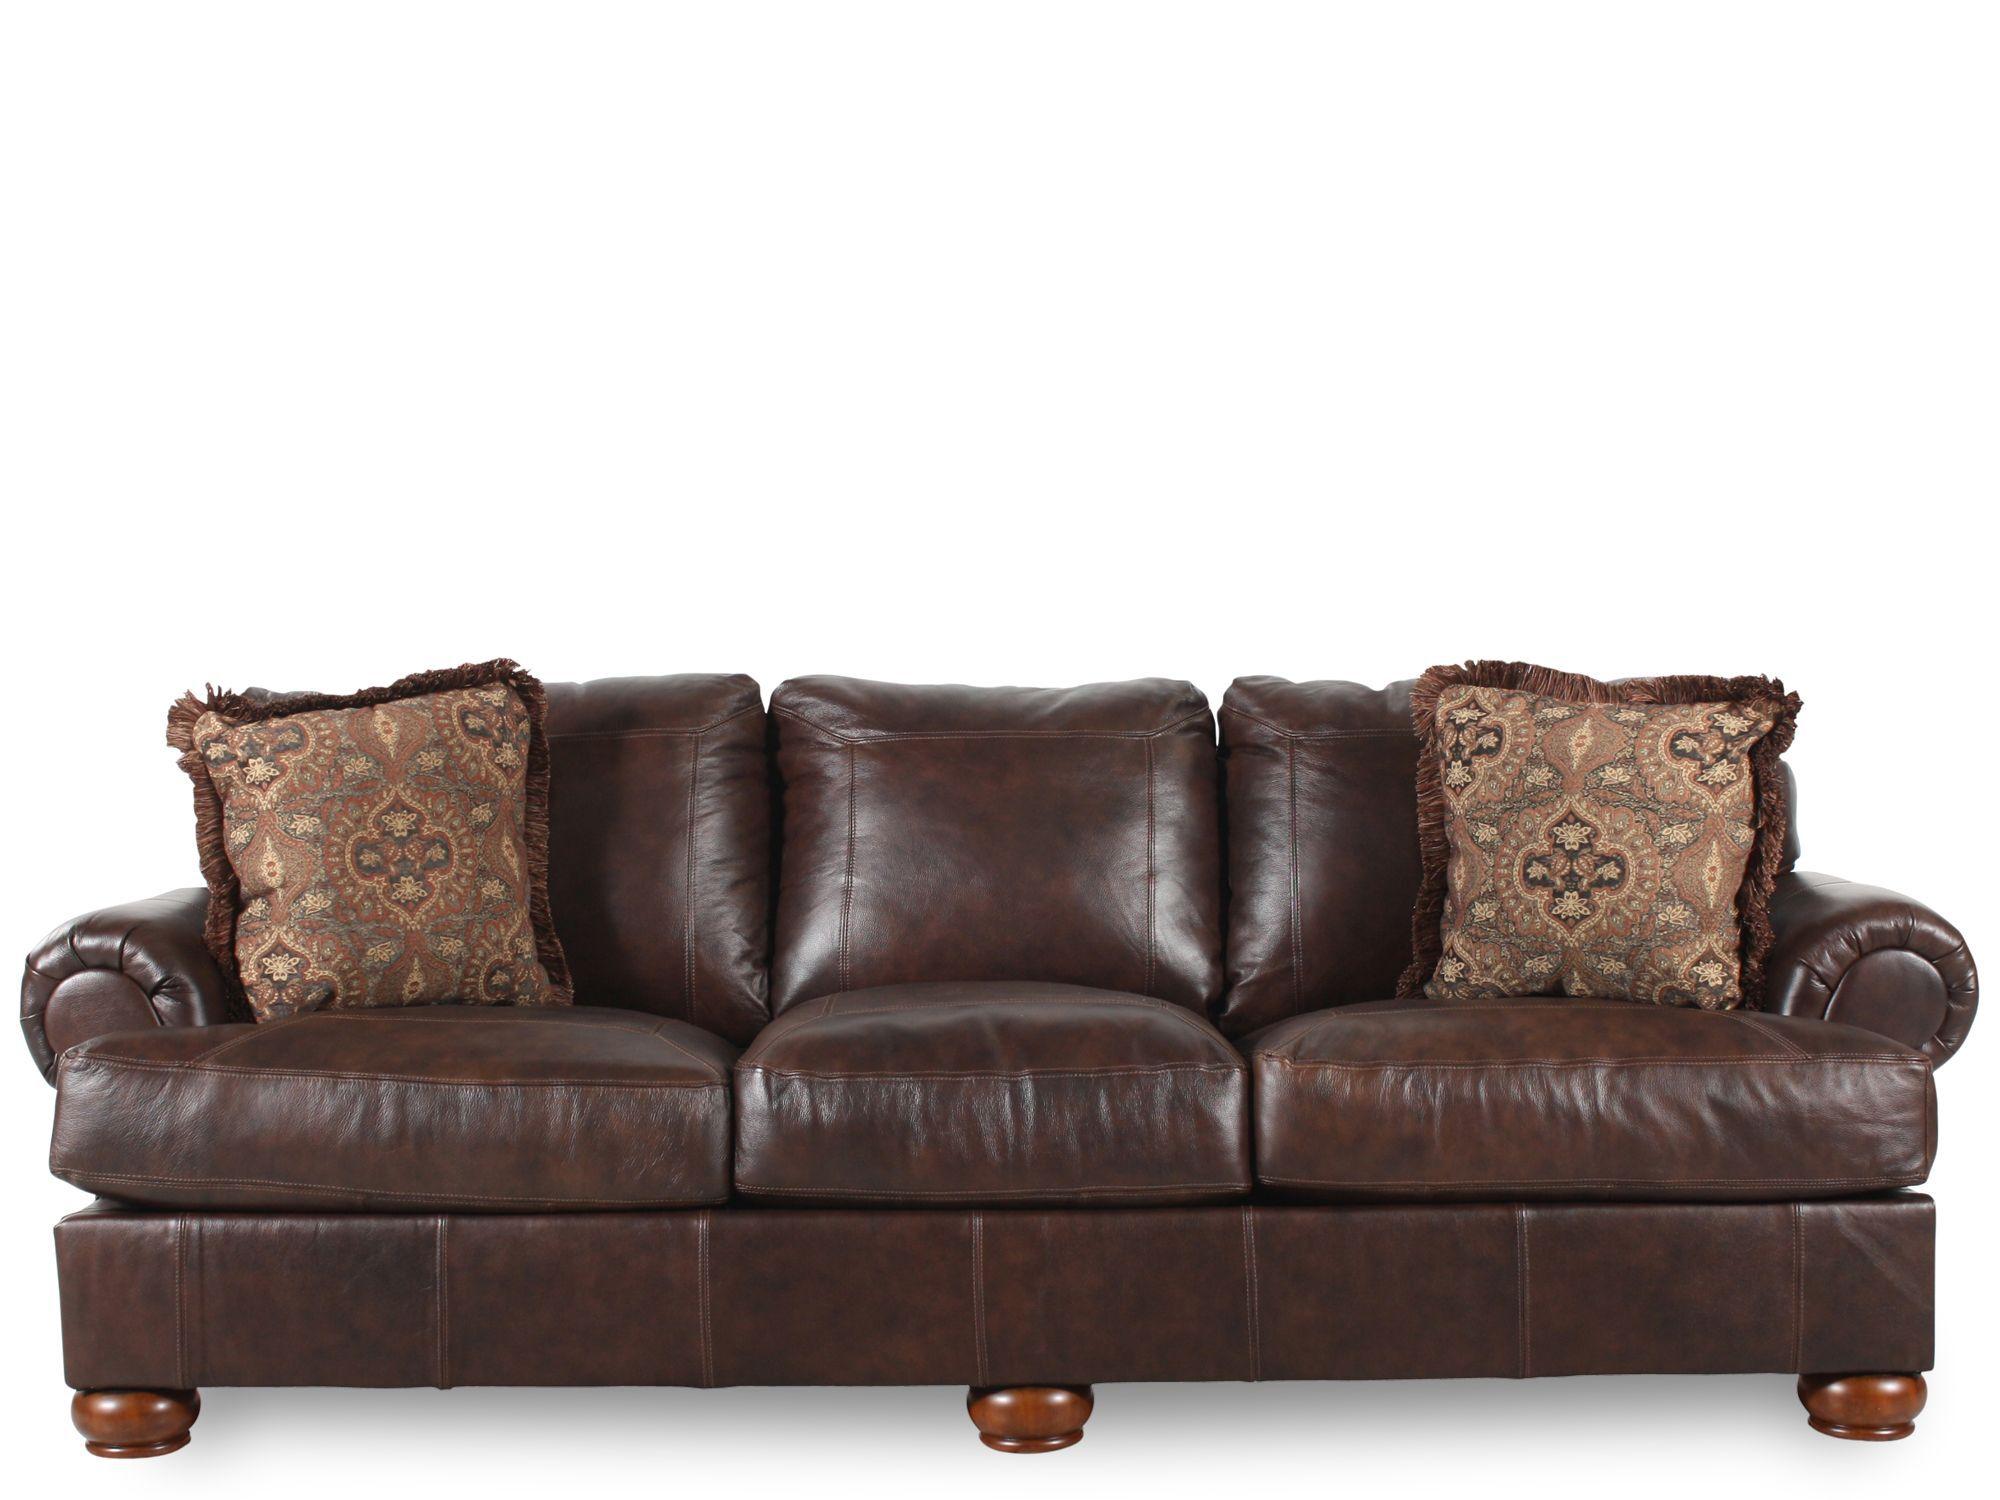 Images Traditional 100u0026quot; Sofa In Dark Walnut Traditional 100u0026quot; Sofa  In Dark Walnut